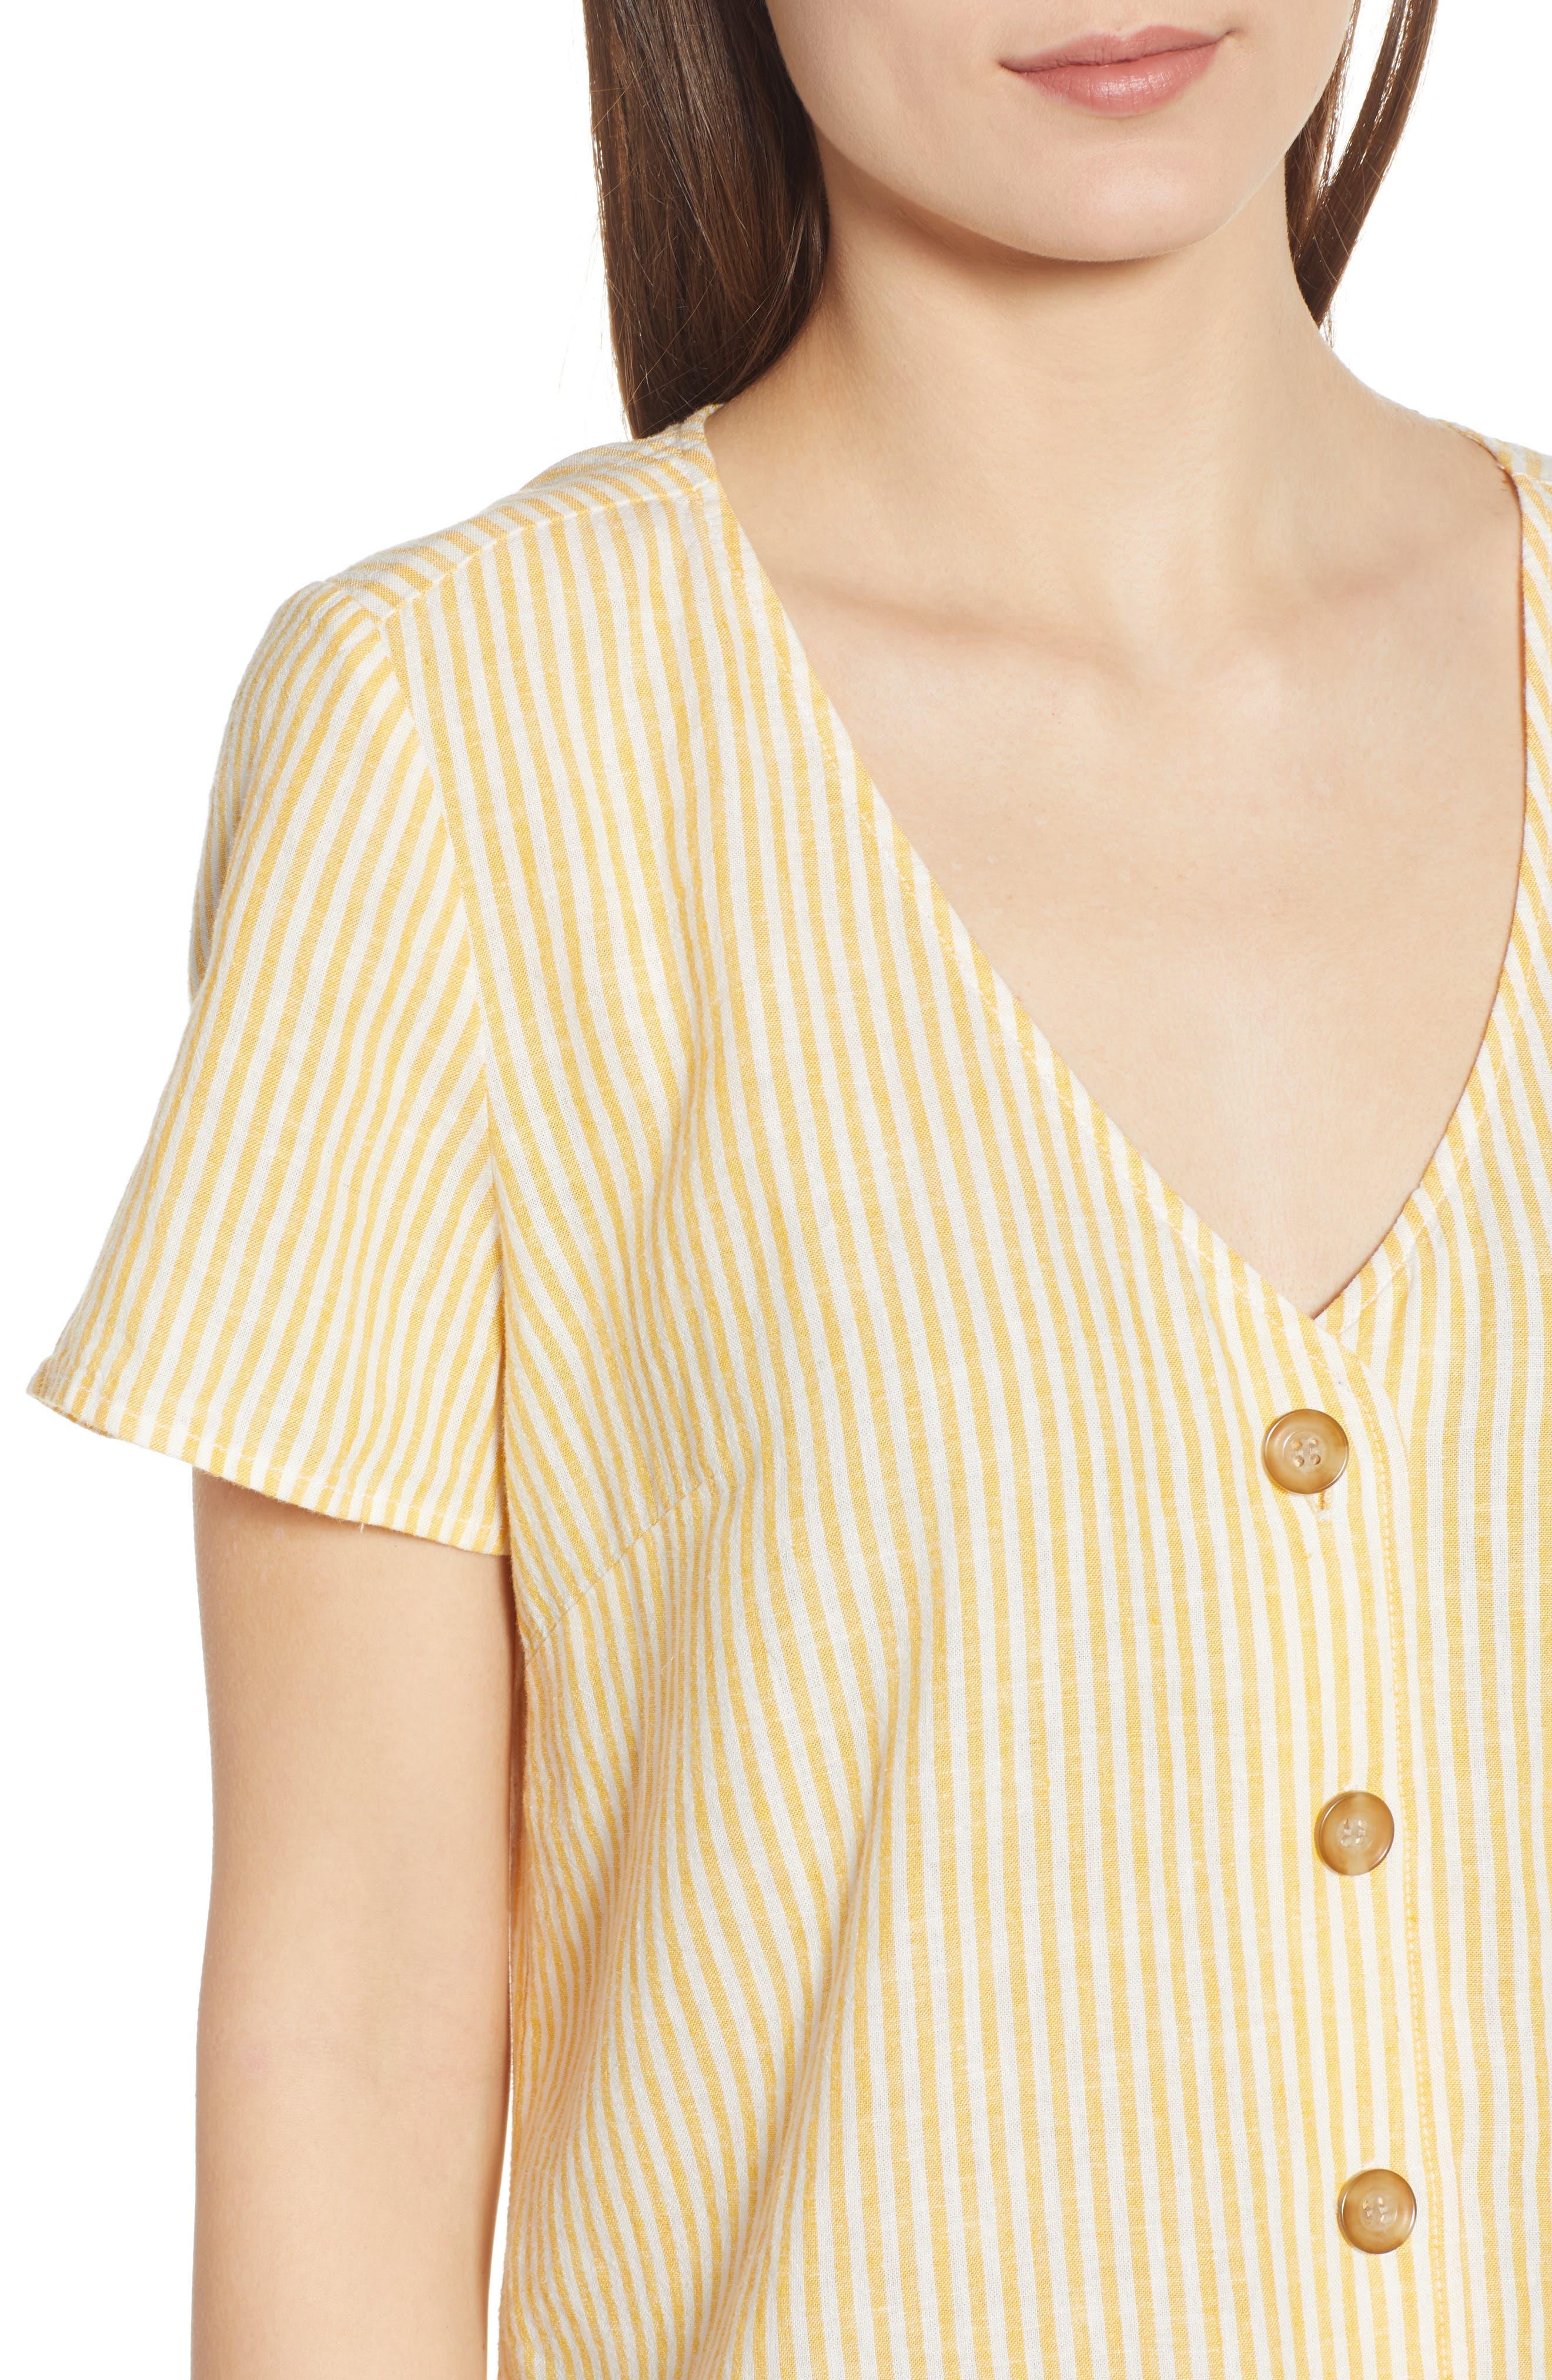 BP.,                             Button Front Linen Blend Top,                             Alternate thumbnail 5, color,                             YELLOW WHIP MARA STRIPE